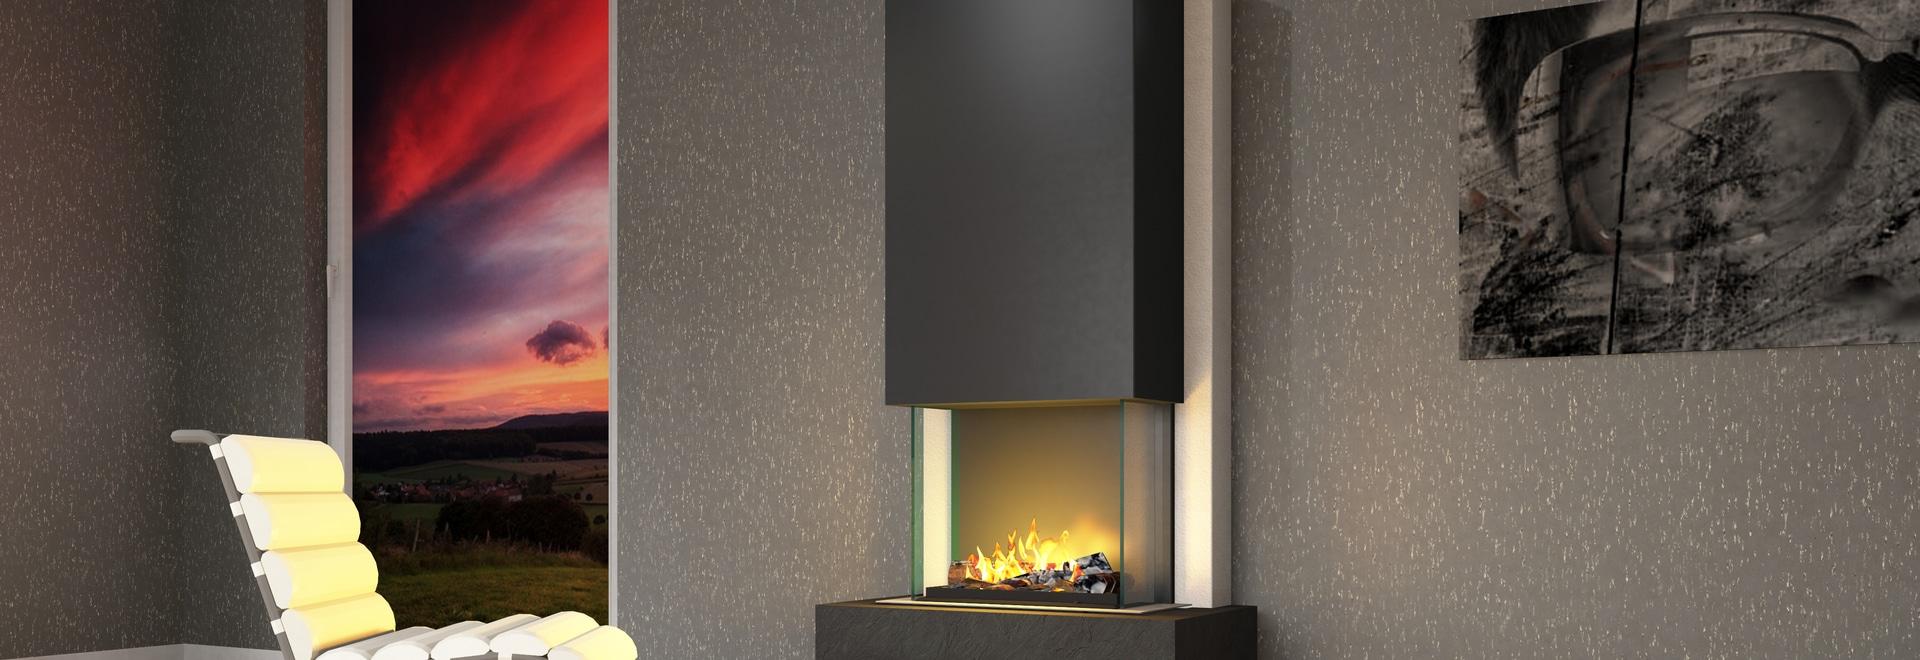 muenkel design Arco [chimenea eléctrica Opti-myst heat]